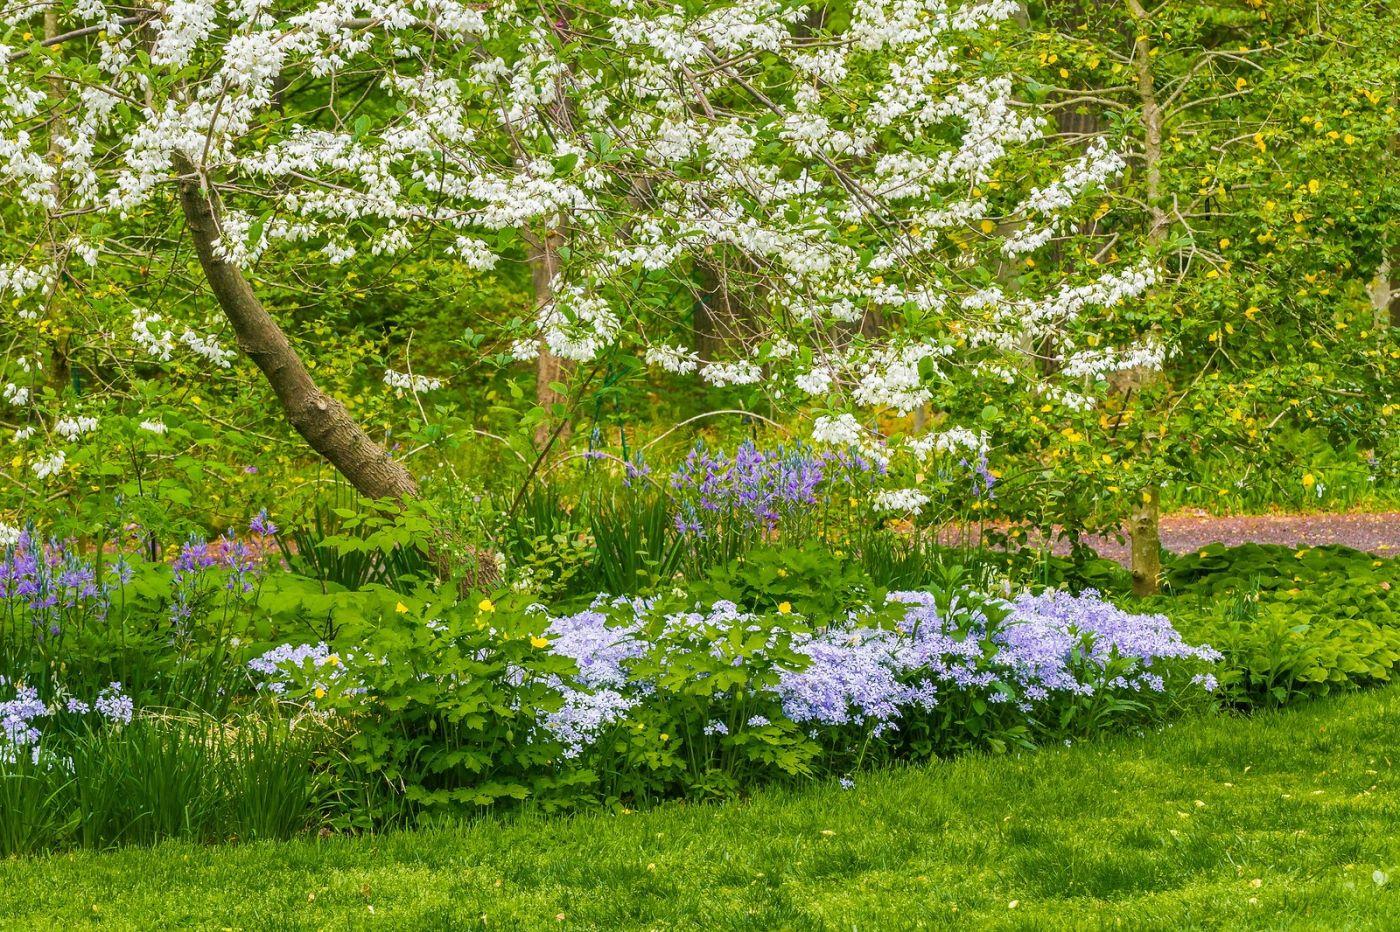 Chanticleer花园,有梦想的季节_图1-25